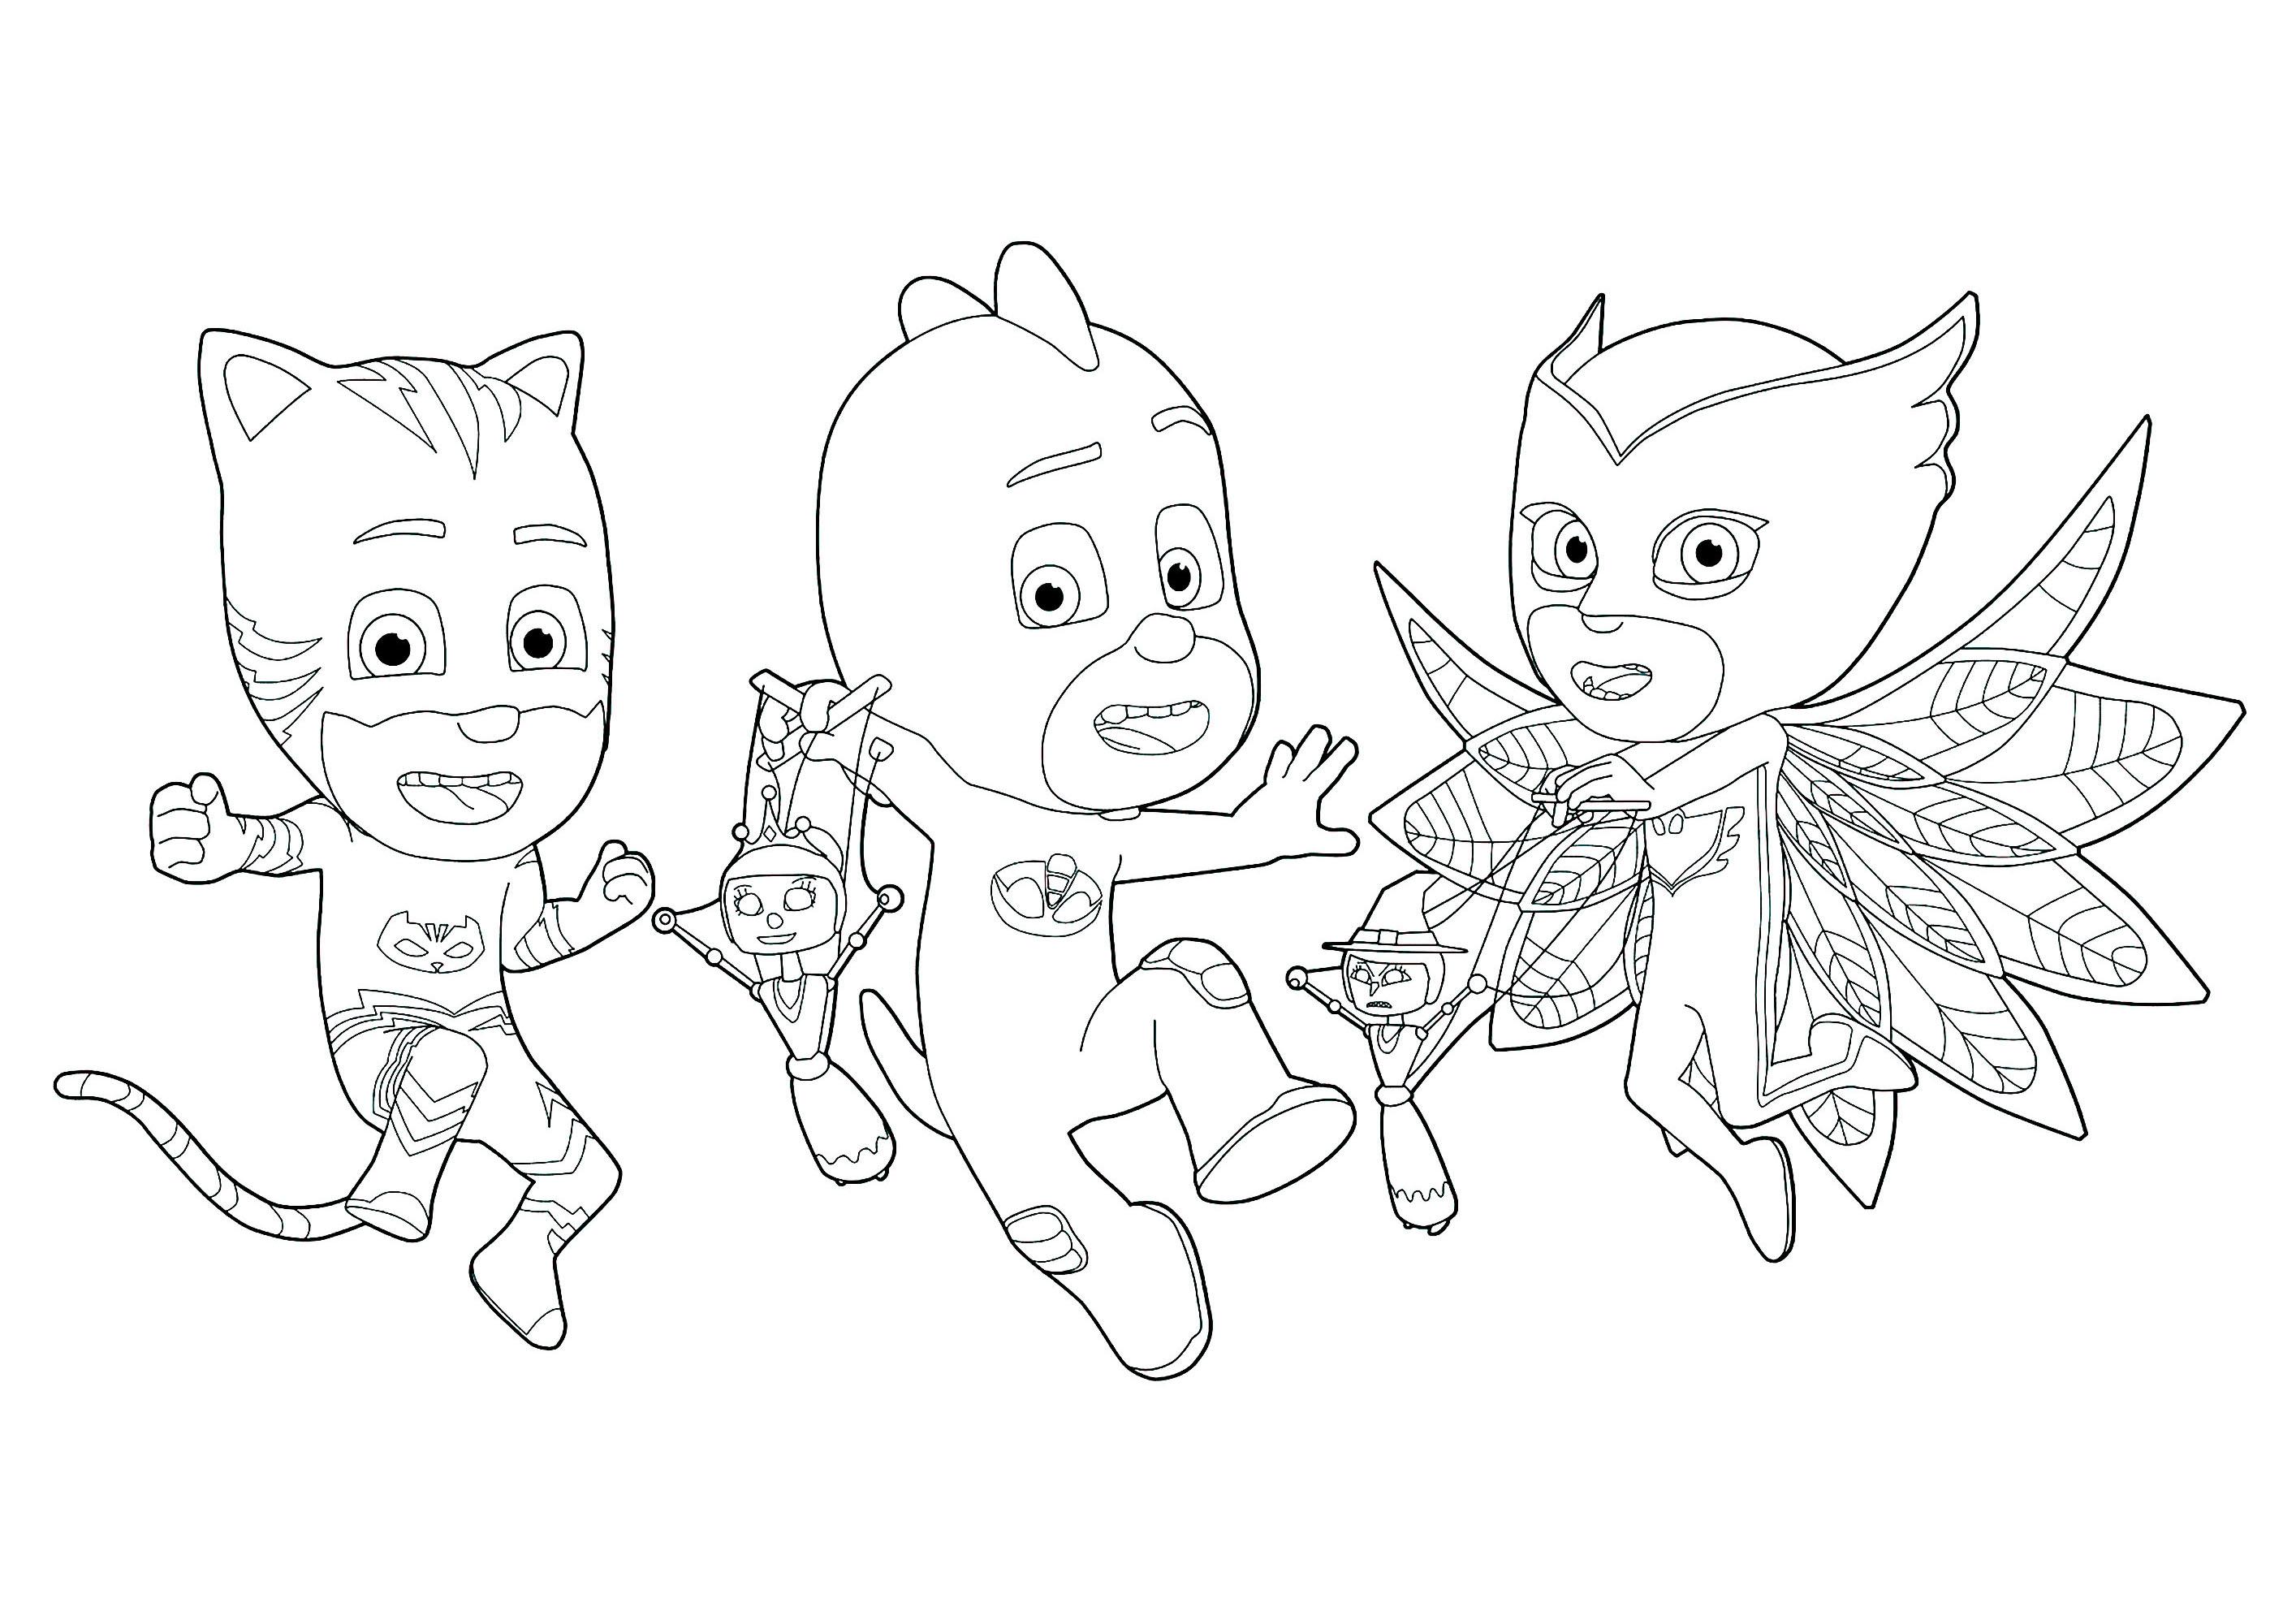 Funny PJ Masks coloring page